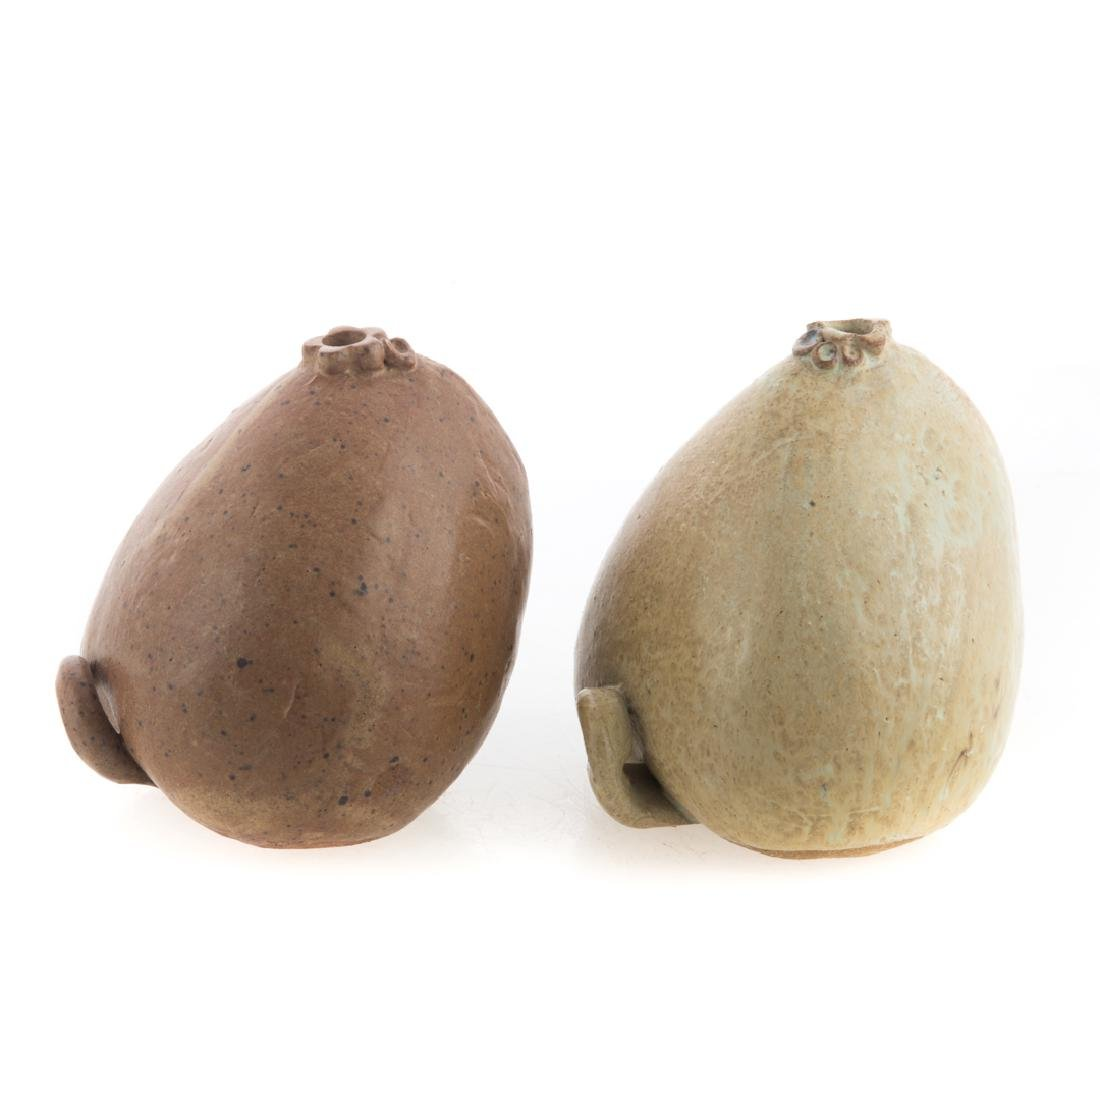 Slaithong Schmutzhart. Two ceramic fruits - 2